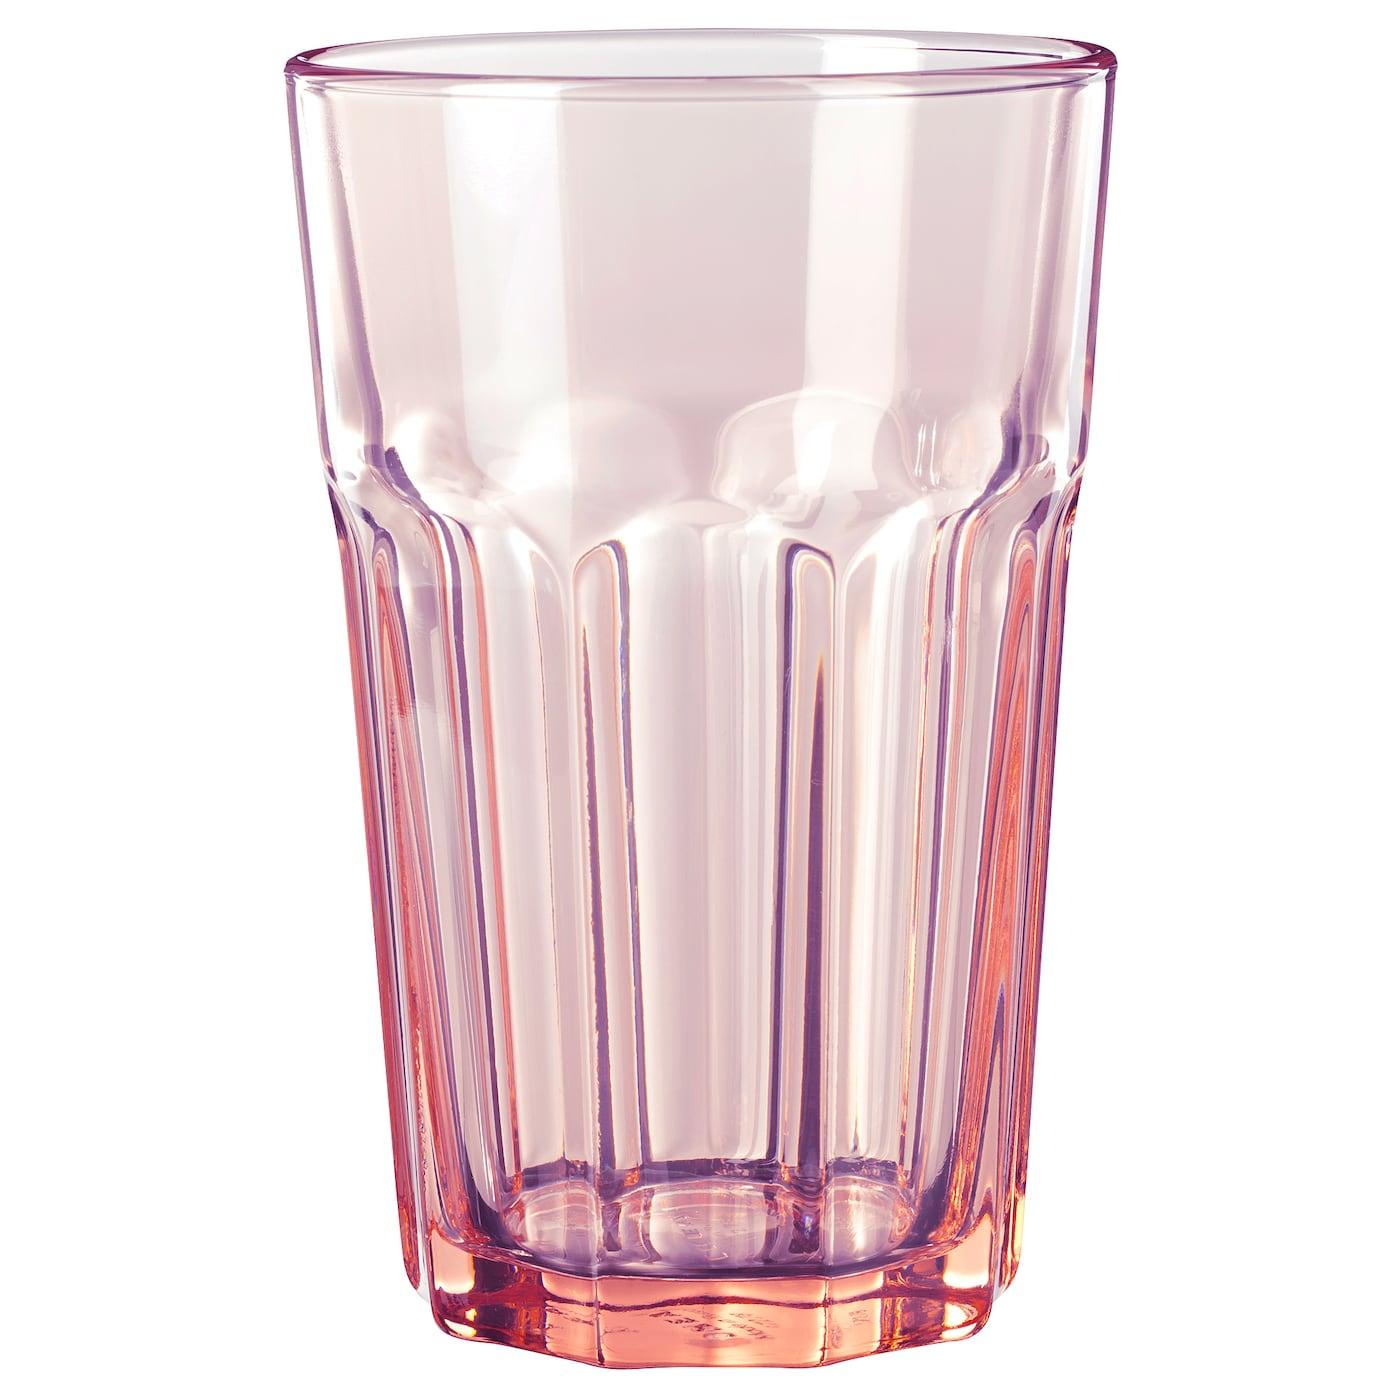 Ikea Pokal Rosa